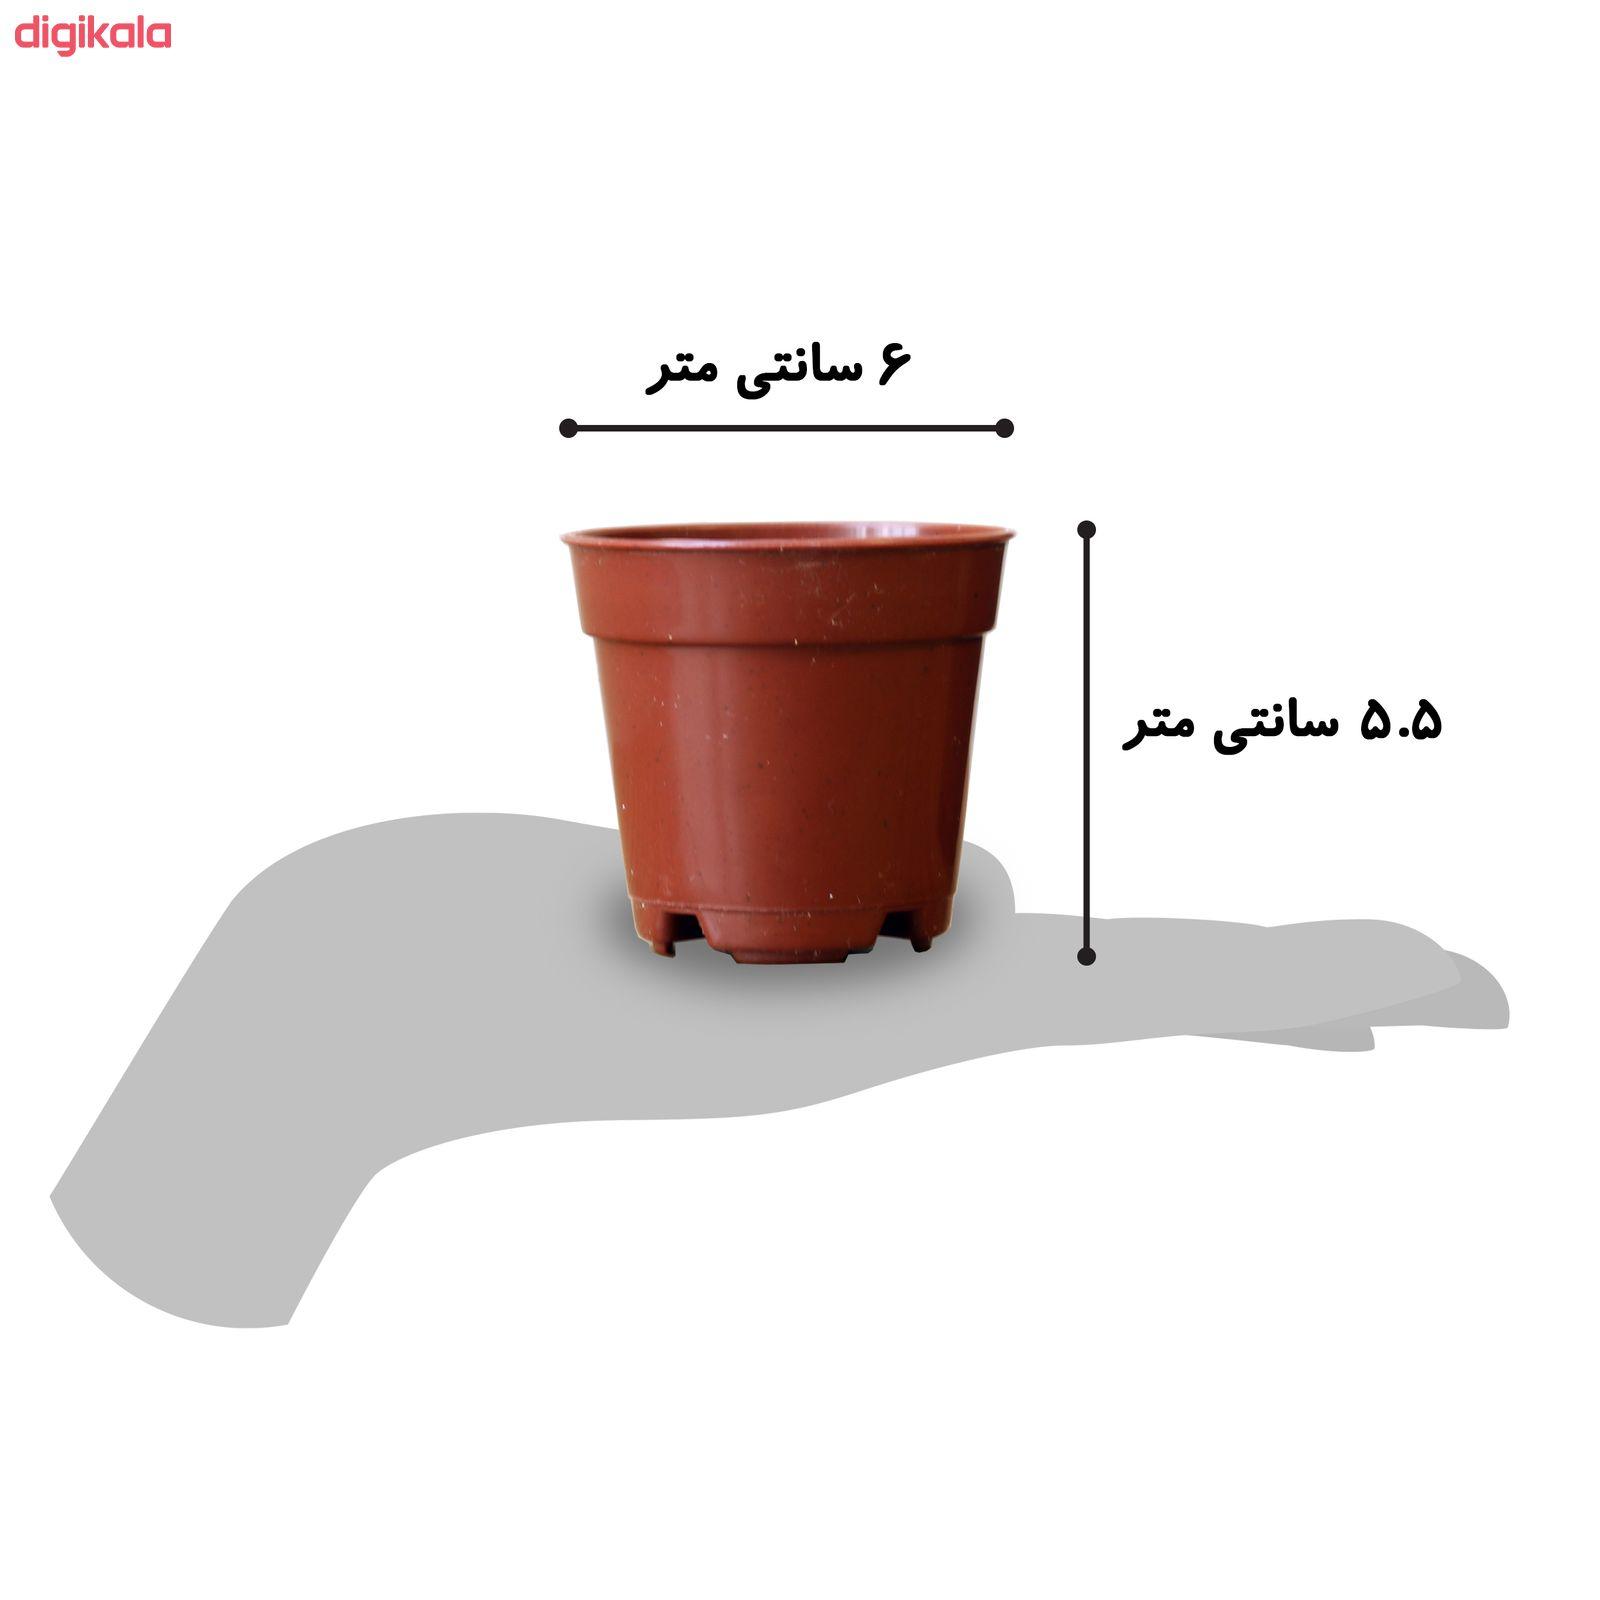 گیاه طبیعی ساکولنت آیدین کاکتوس کد CB-003 بسته 12 عددی main 1 9